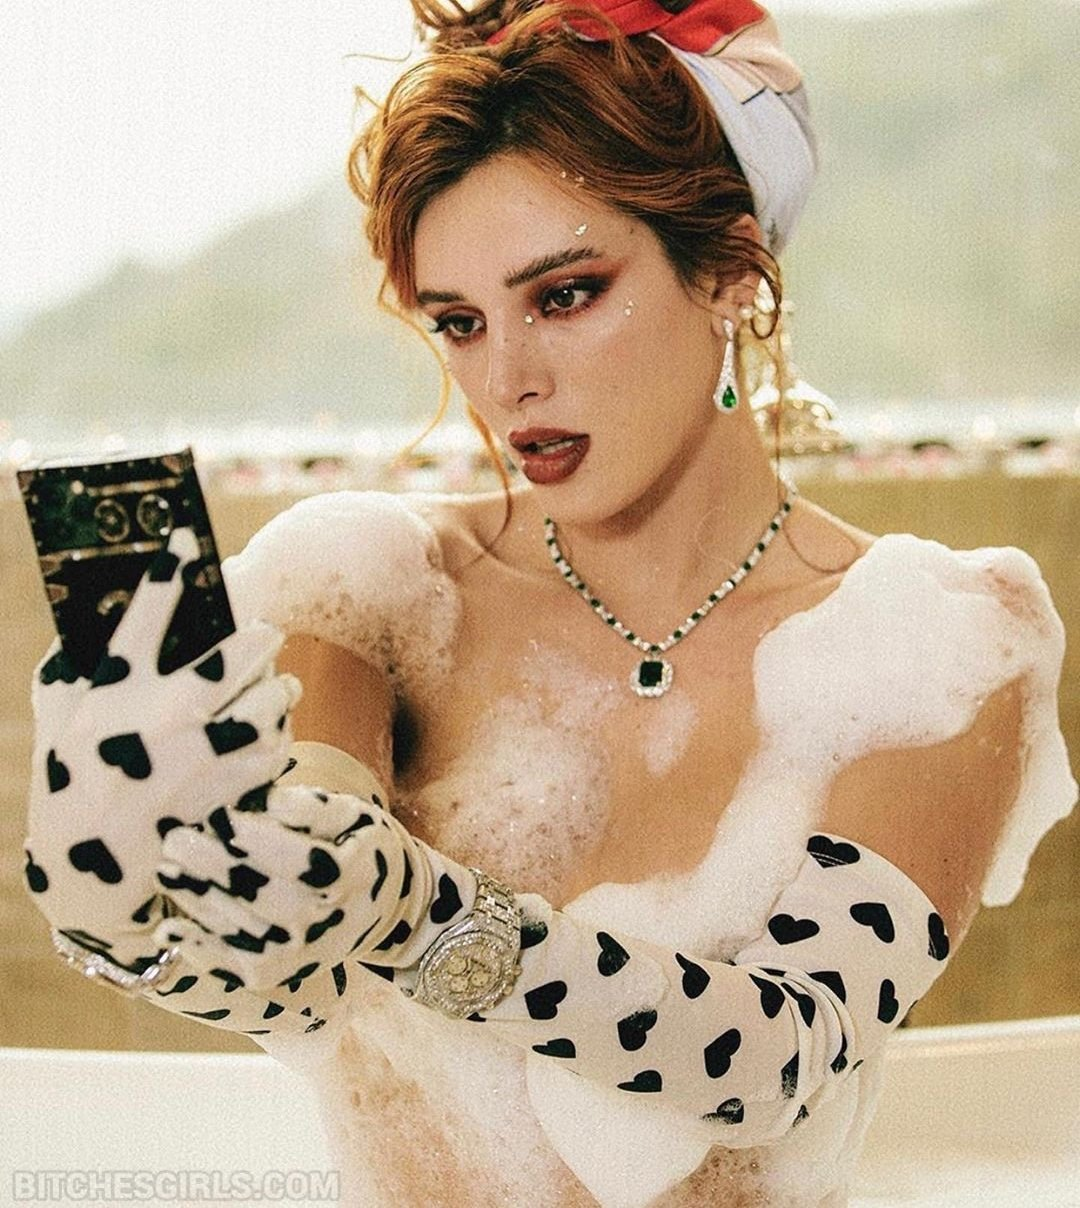 Bella Thorne Bellathorne Onlyfans Nude Leaks 0027